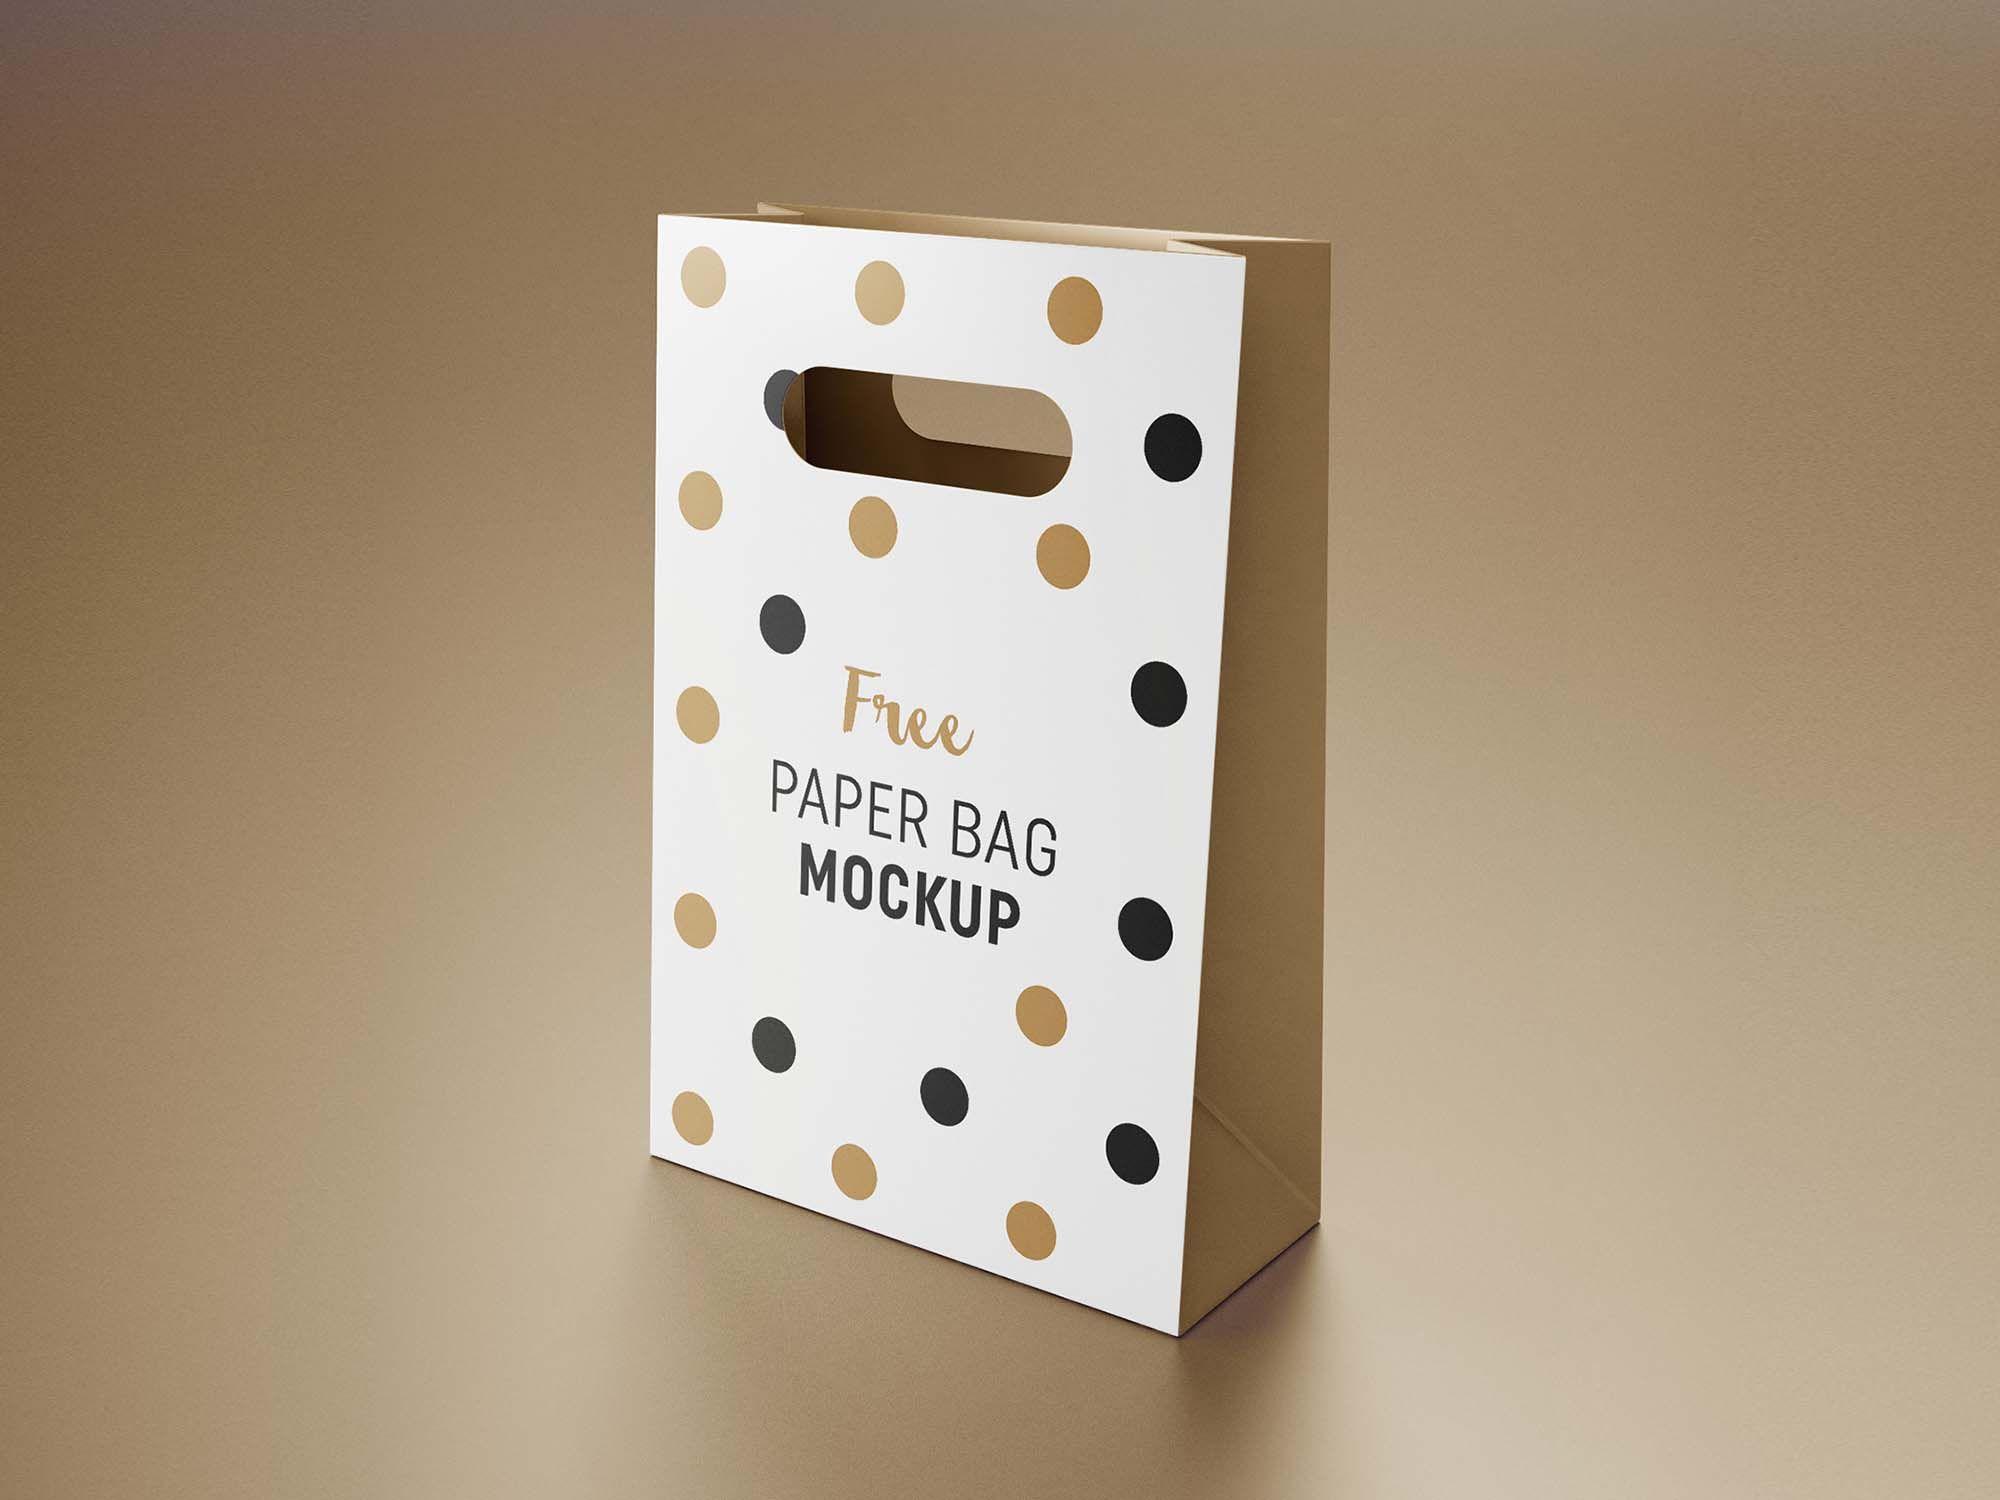 Download Eco Friendly Gift Bag Mockup Psd Bag Mockup Eco Friendly Gift Bags Branding Design Packaging